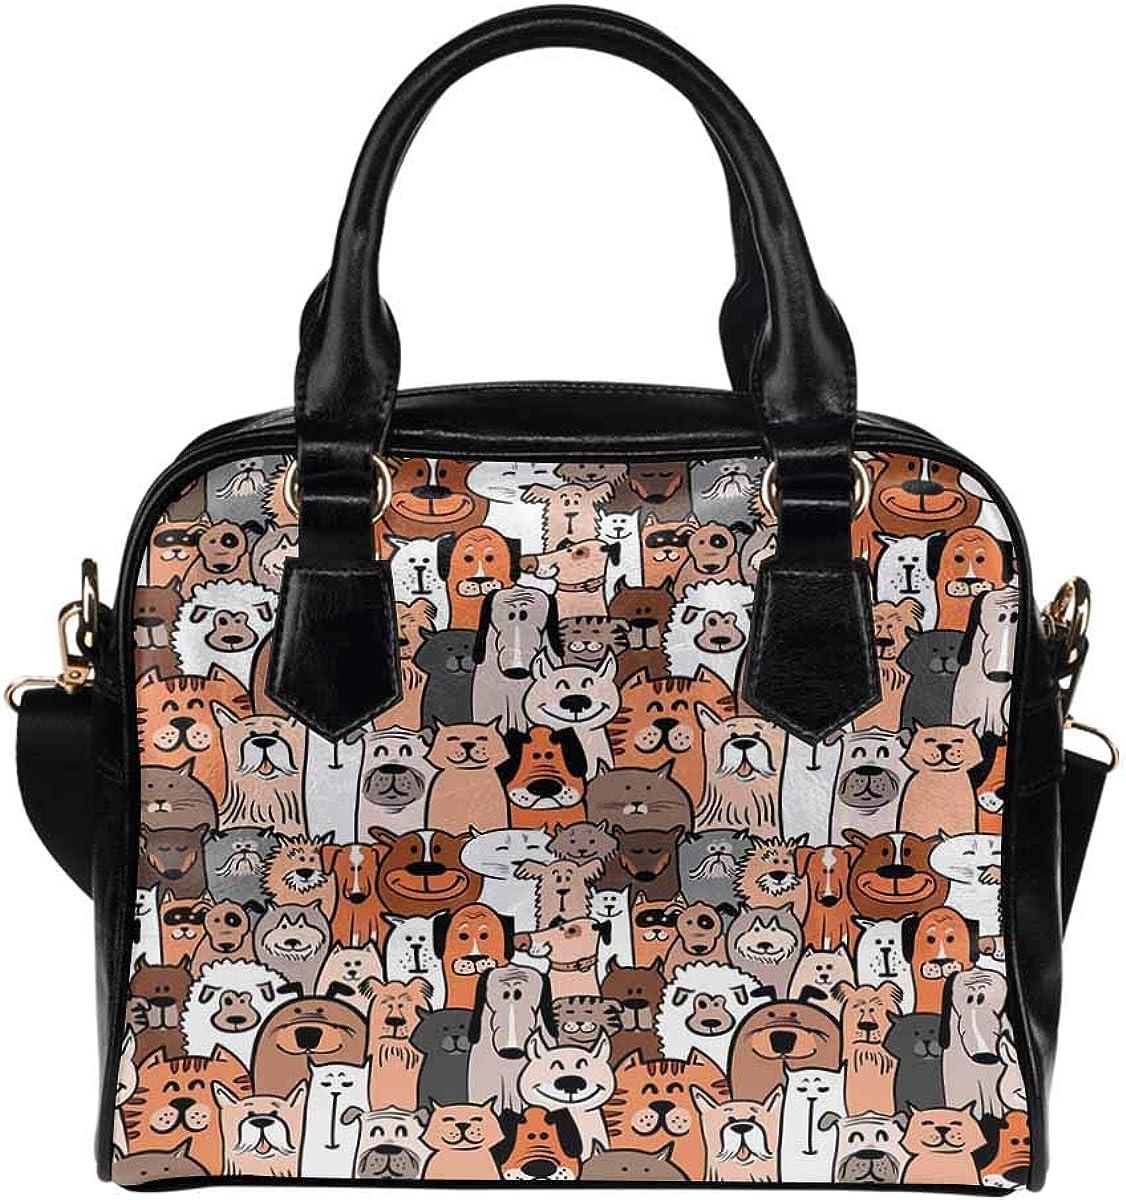 Pet Cat Kitty Paw Print Challenge the lowest price of Japan Women's Shoulde Handbag unisex PU Leather Purse